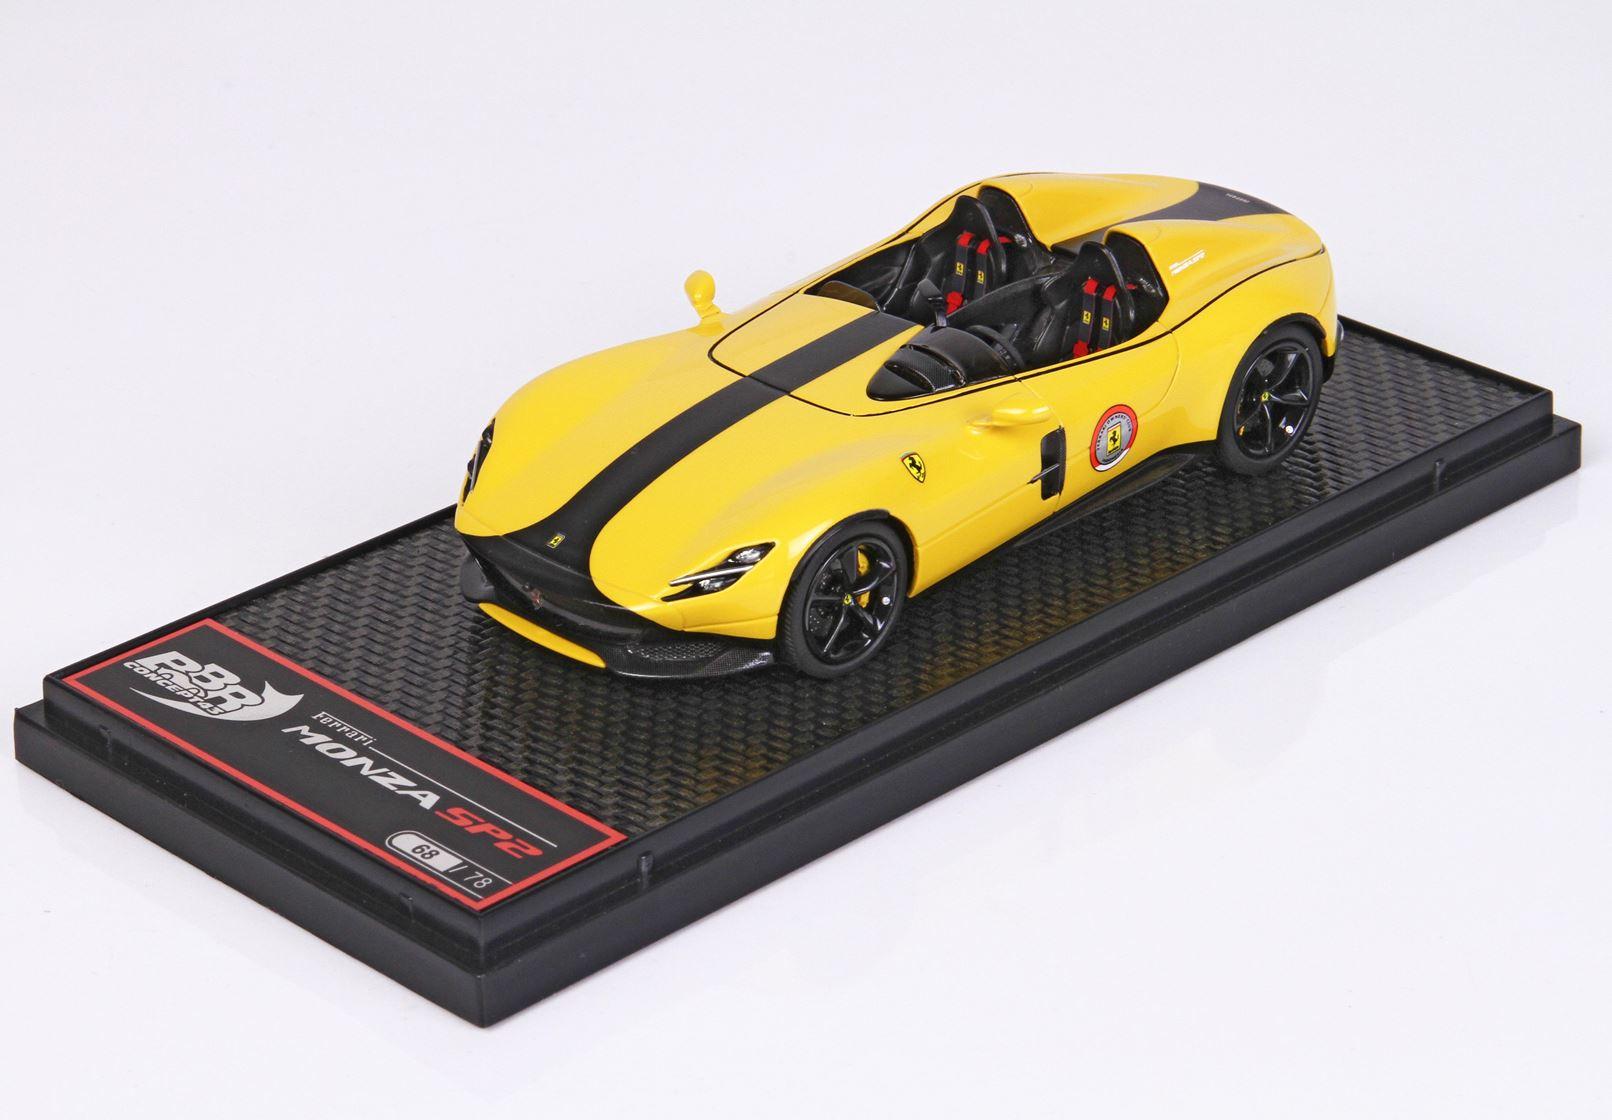 Ferrari Monza Sp2 Giallo Modena Ltd 78 Pcs 1/43 BBR